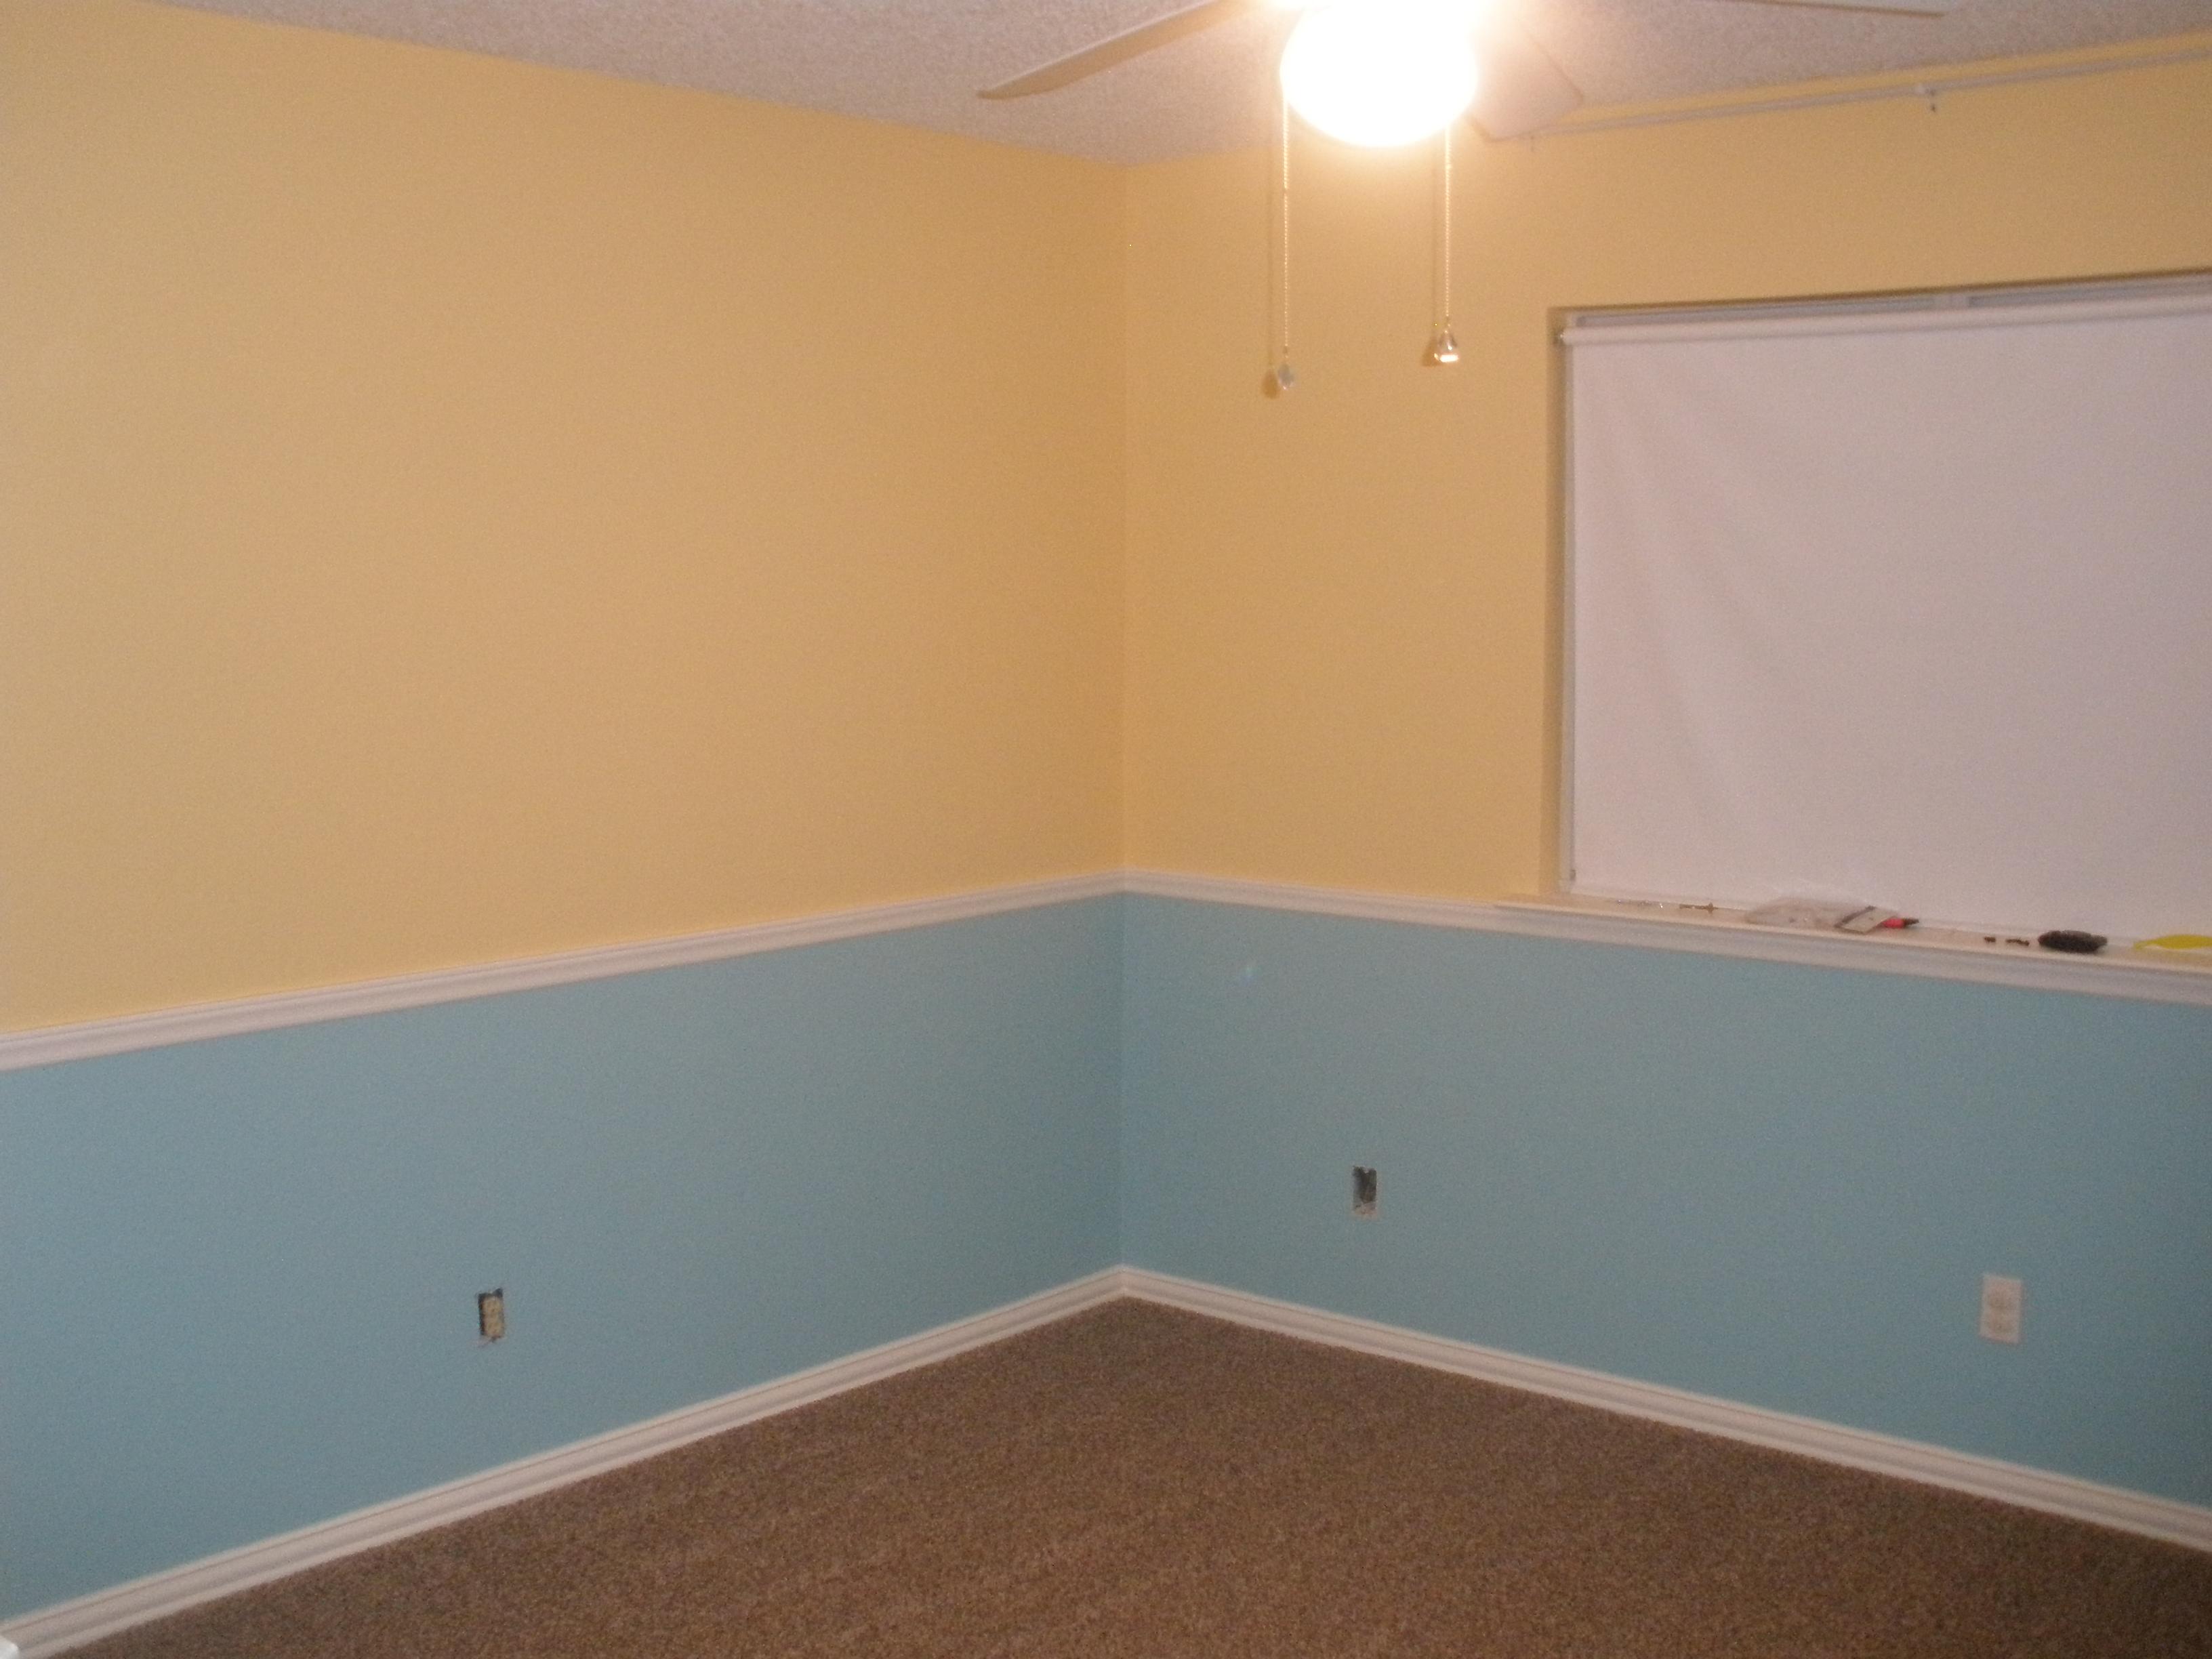 Stylish Home Design Ideas Popular Paint Colors Accent Walls